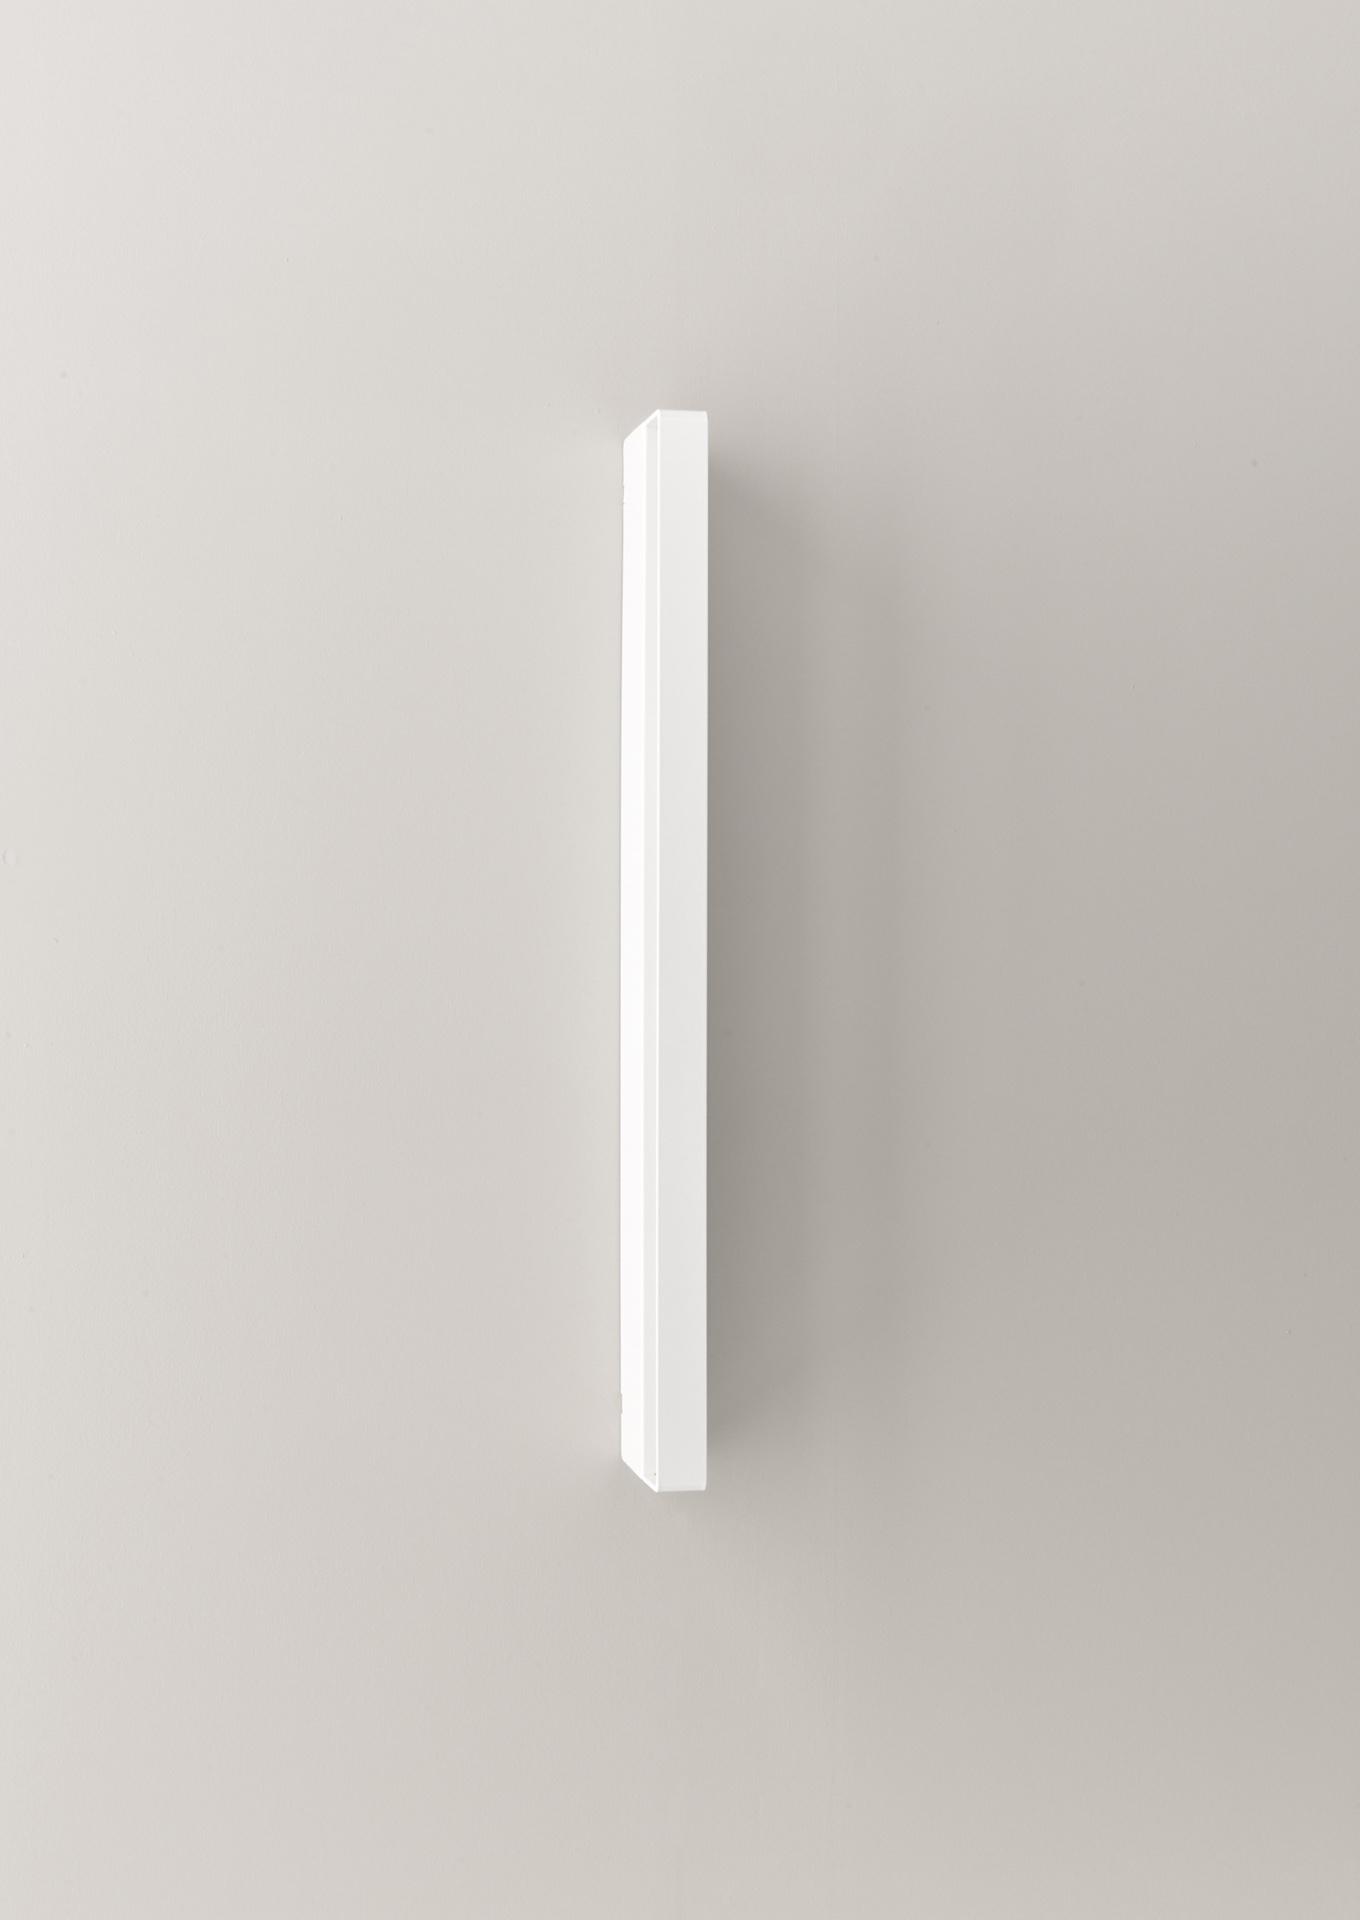 aicci-wl1-600-valaisin-600x28x110mm-pystysuuntainen-valkoiset-led-valot-1360x1920px